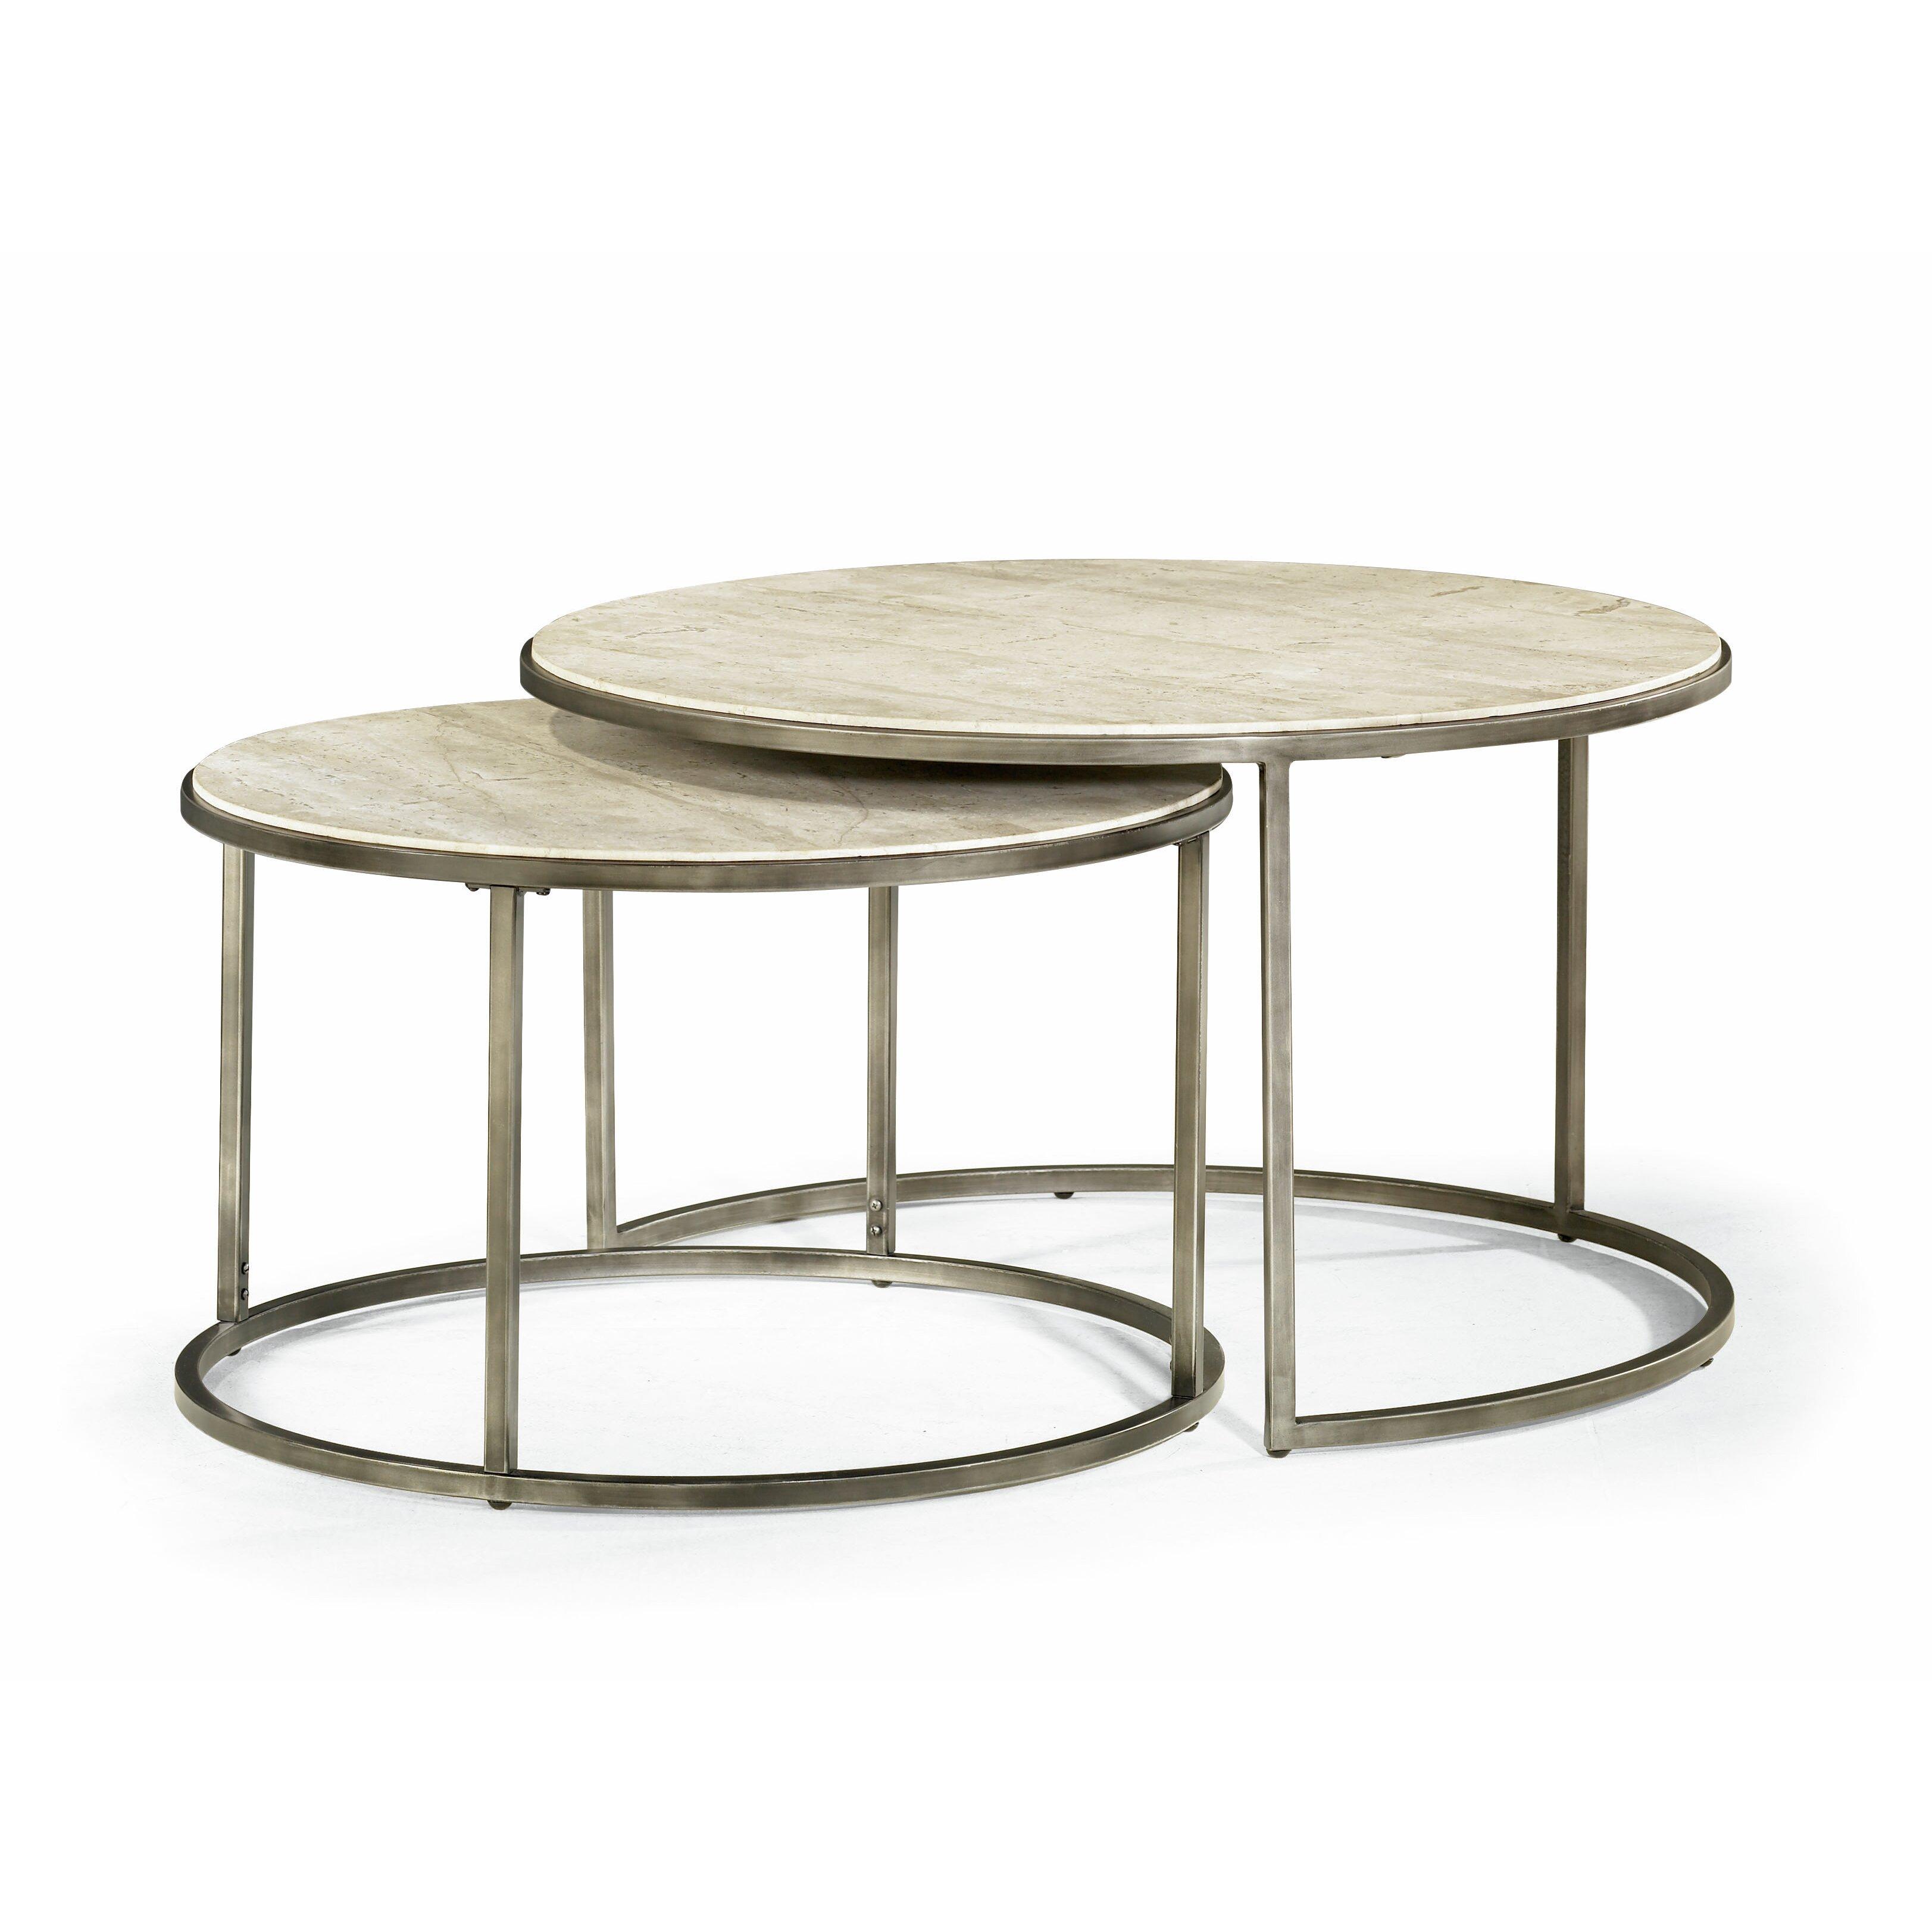 Stools Brayden Studio Reg Masuda Nesting Coffee Table